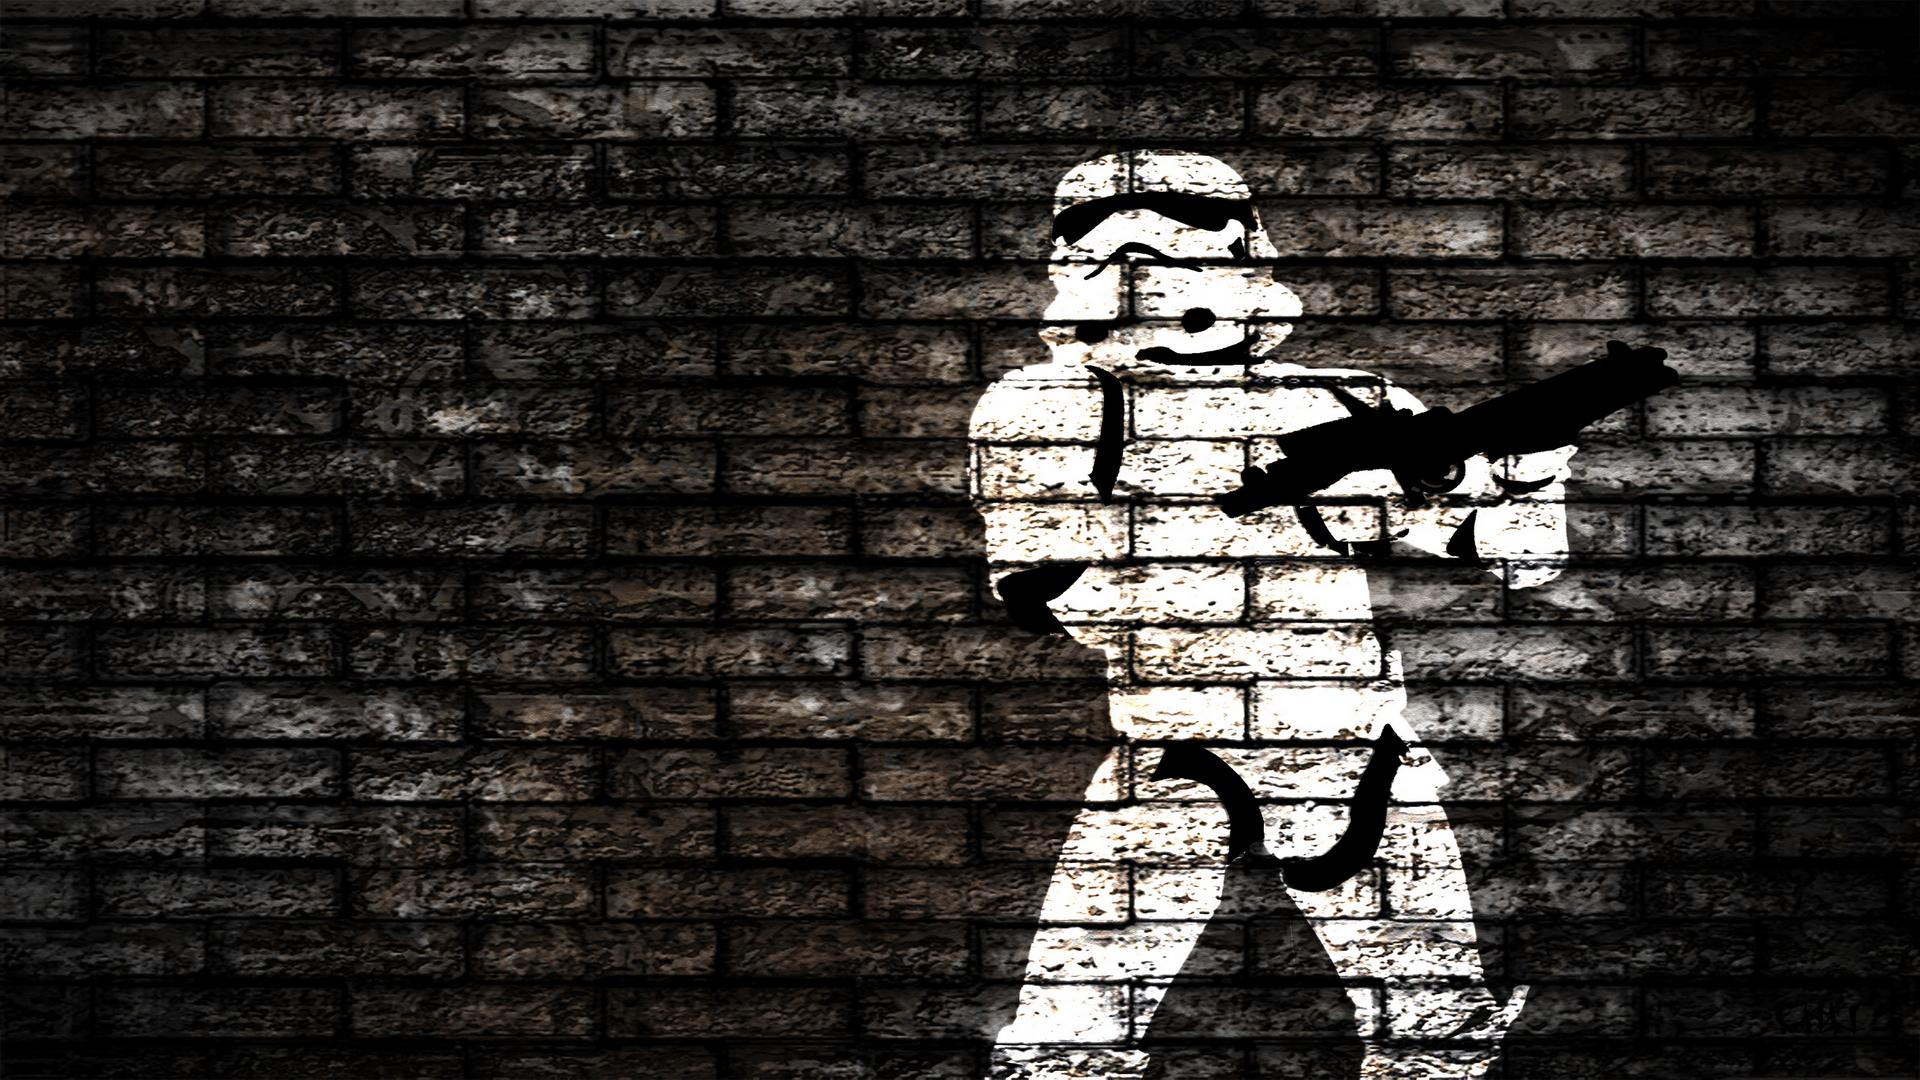 Stormtrooper wallpaper   883385 1920x1080